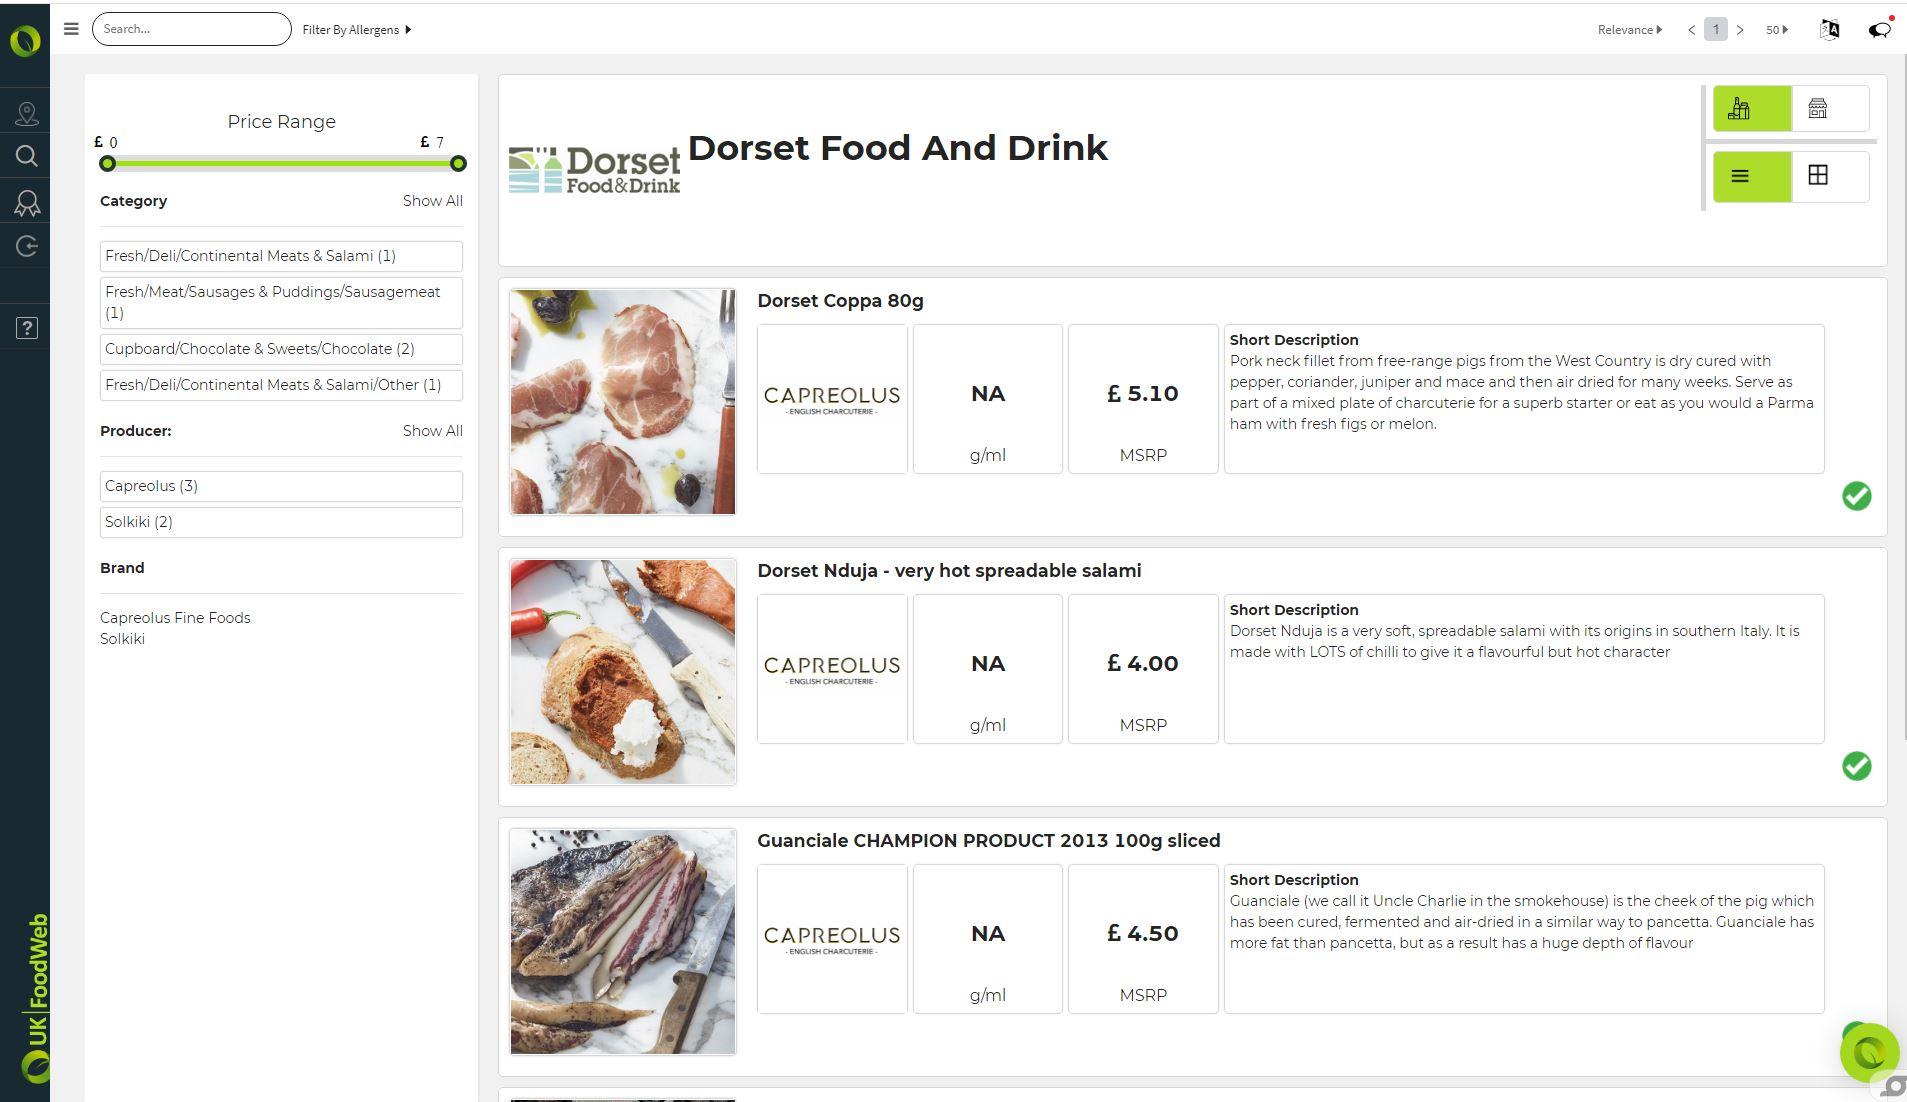 UKFoodWeb food group member product listings